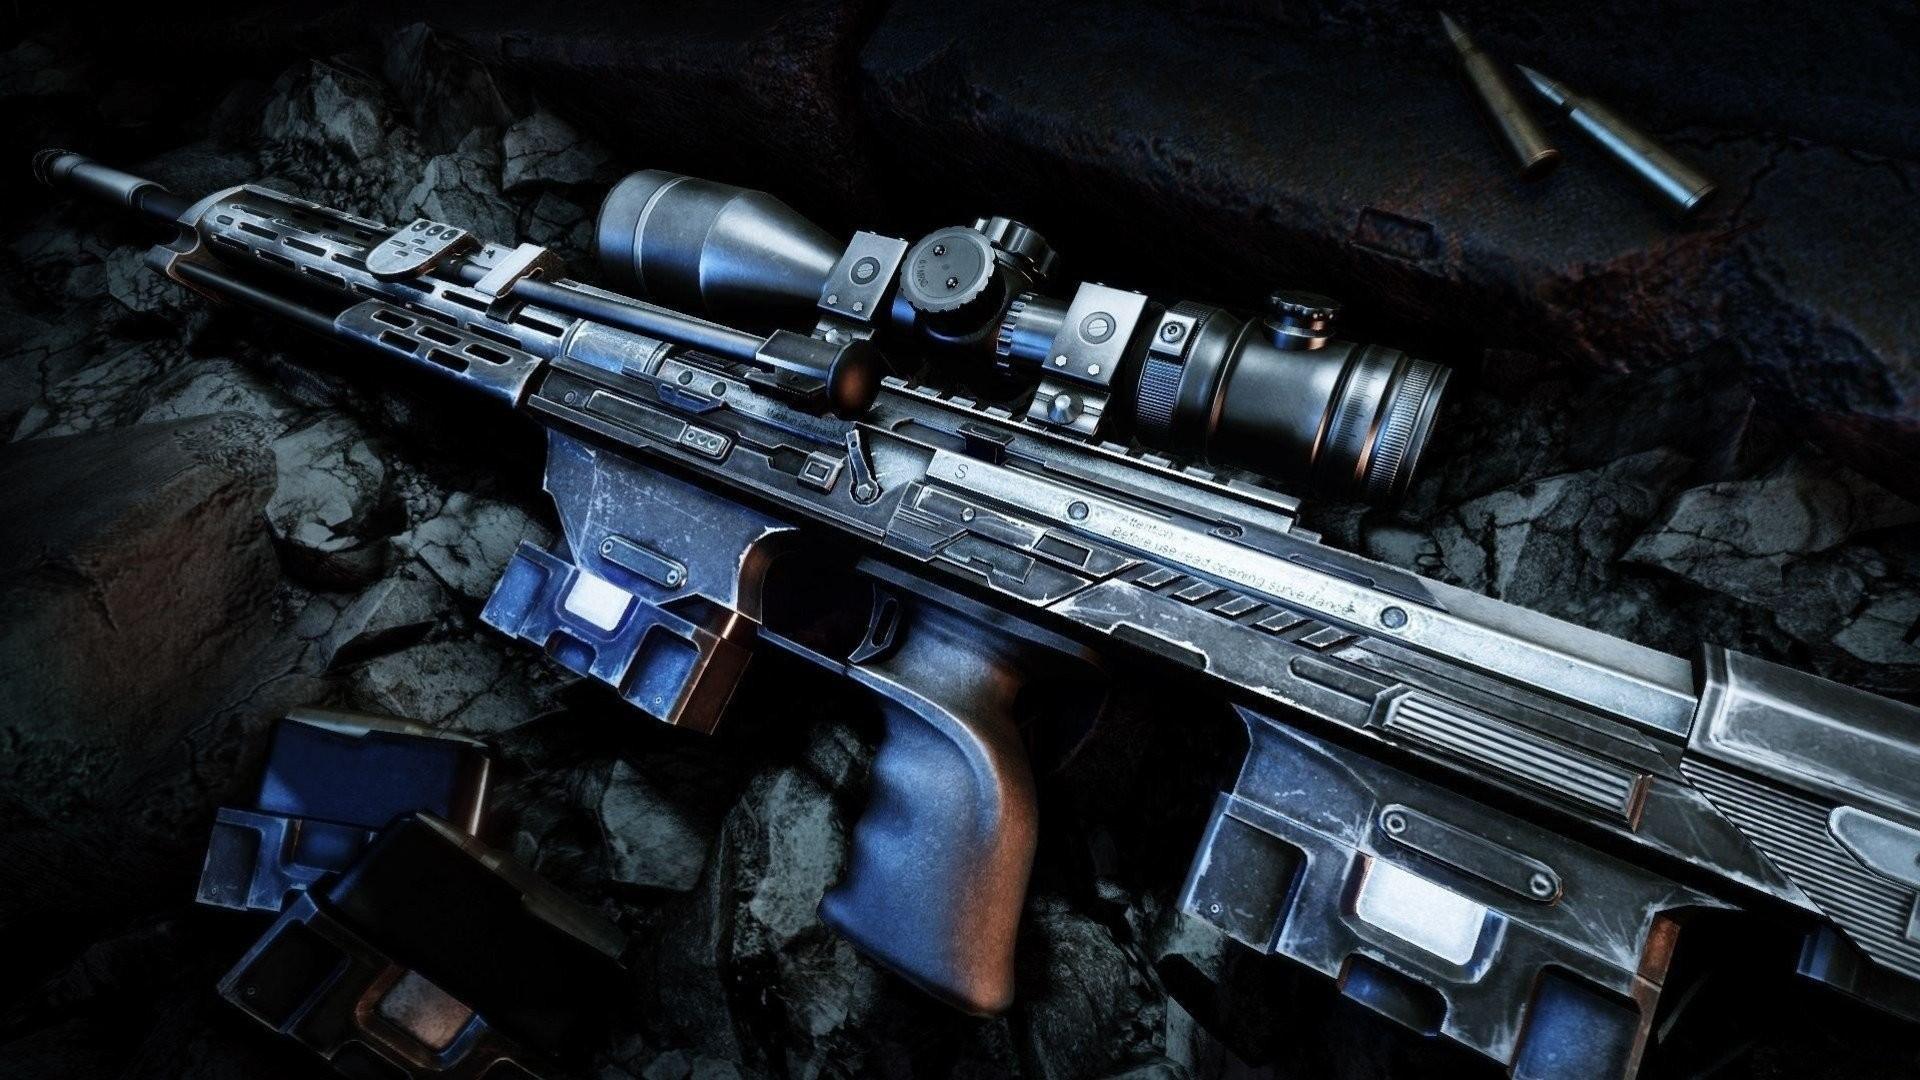 Sniper Gun Wallpapers - Wallpaper Cave |Sniper Rifle Wallpaper